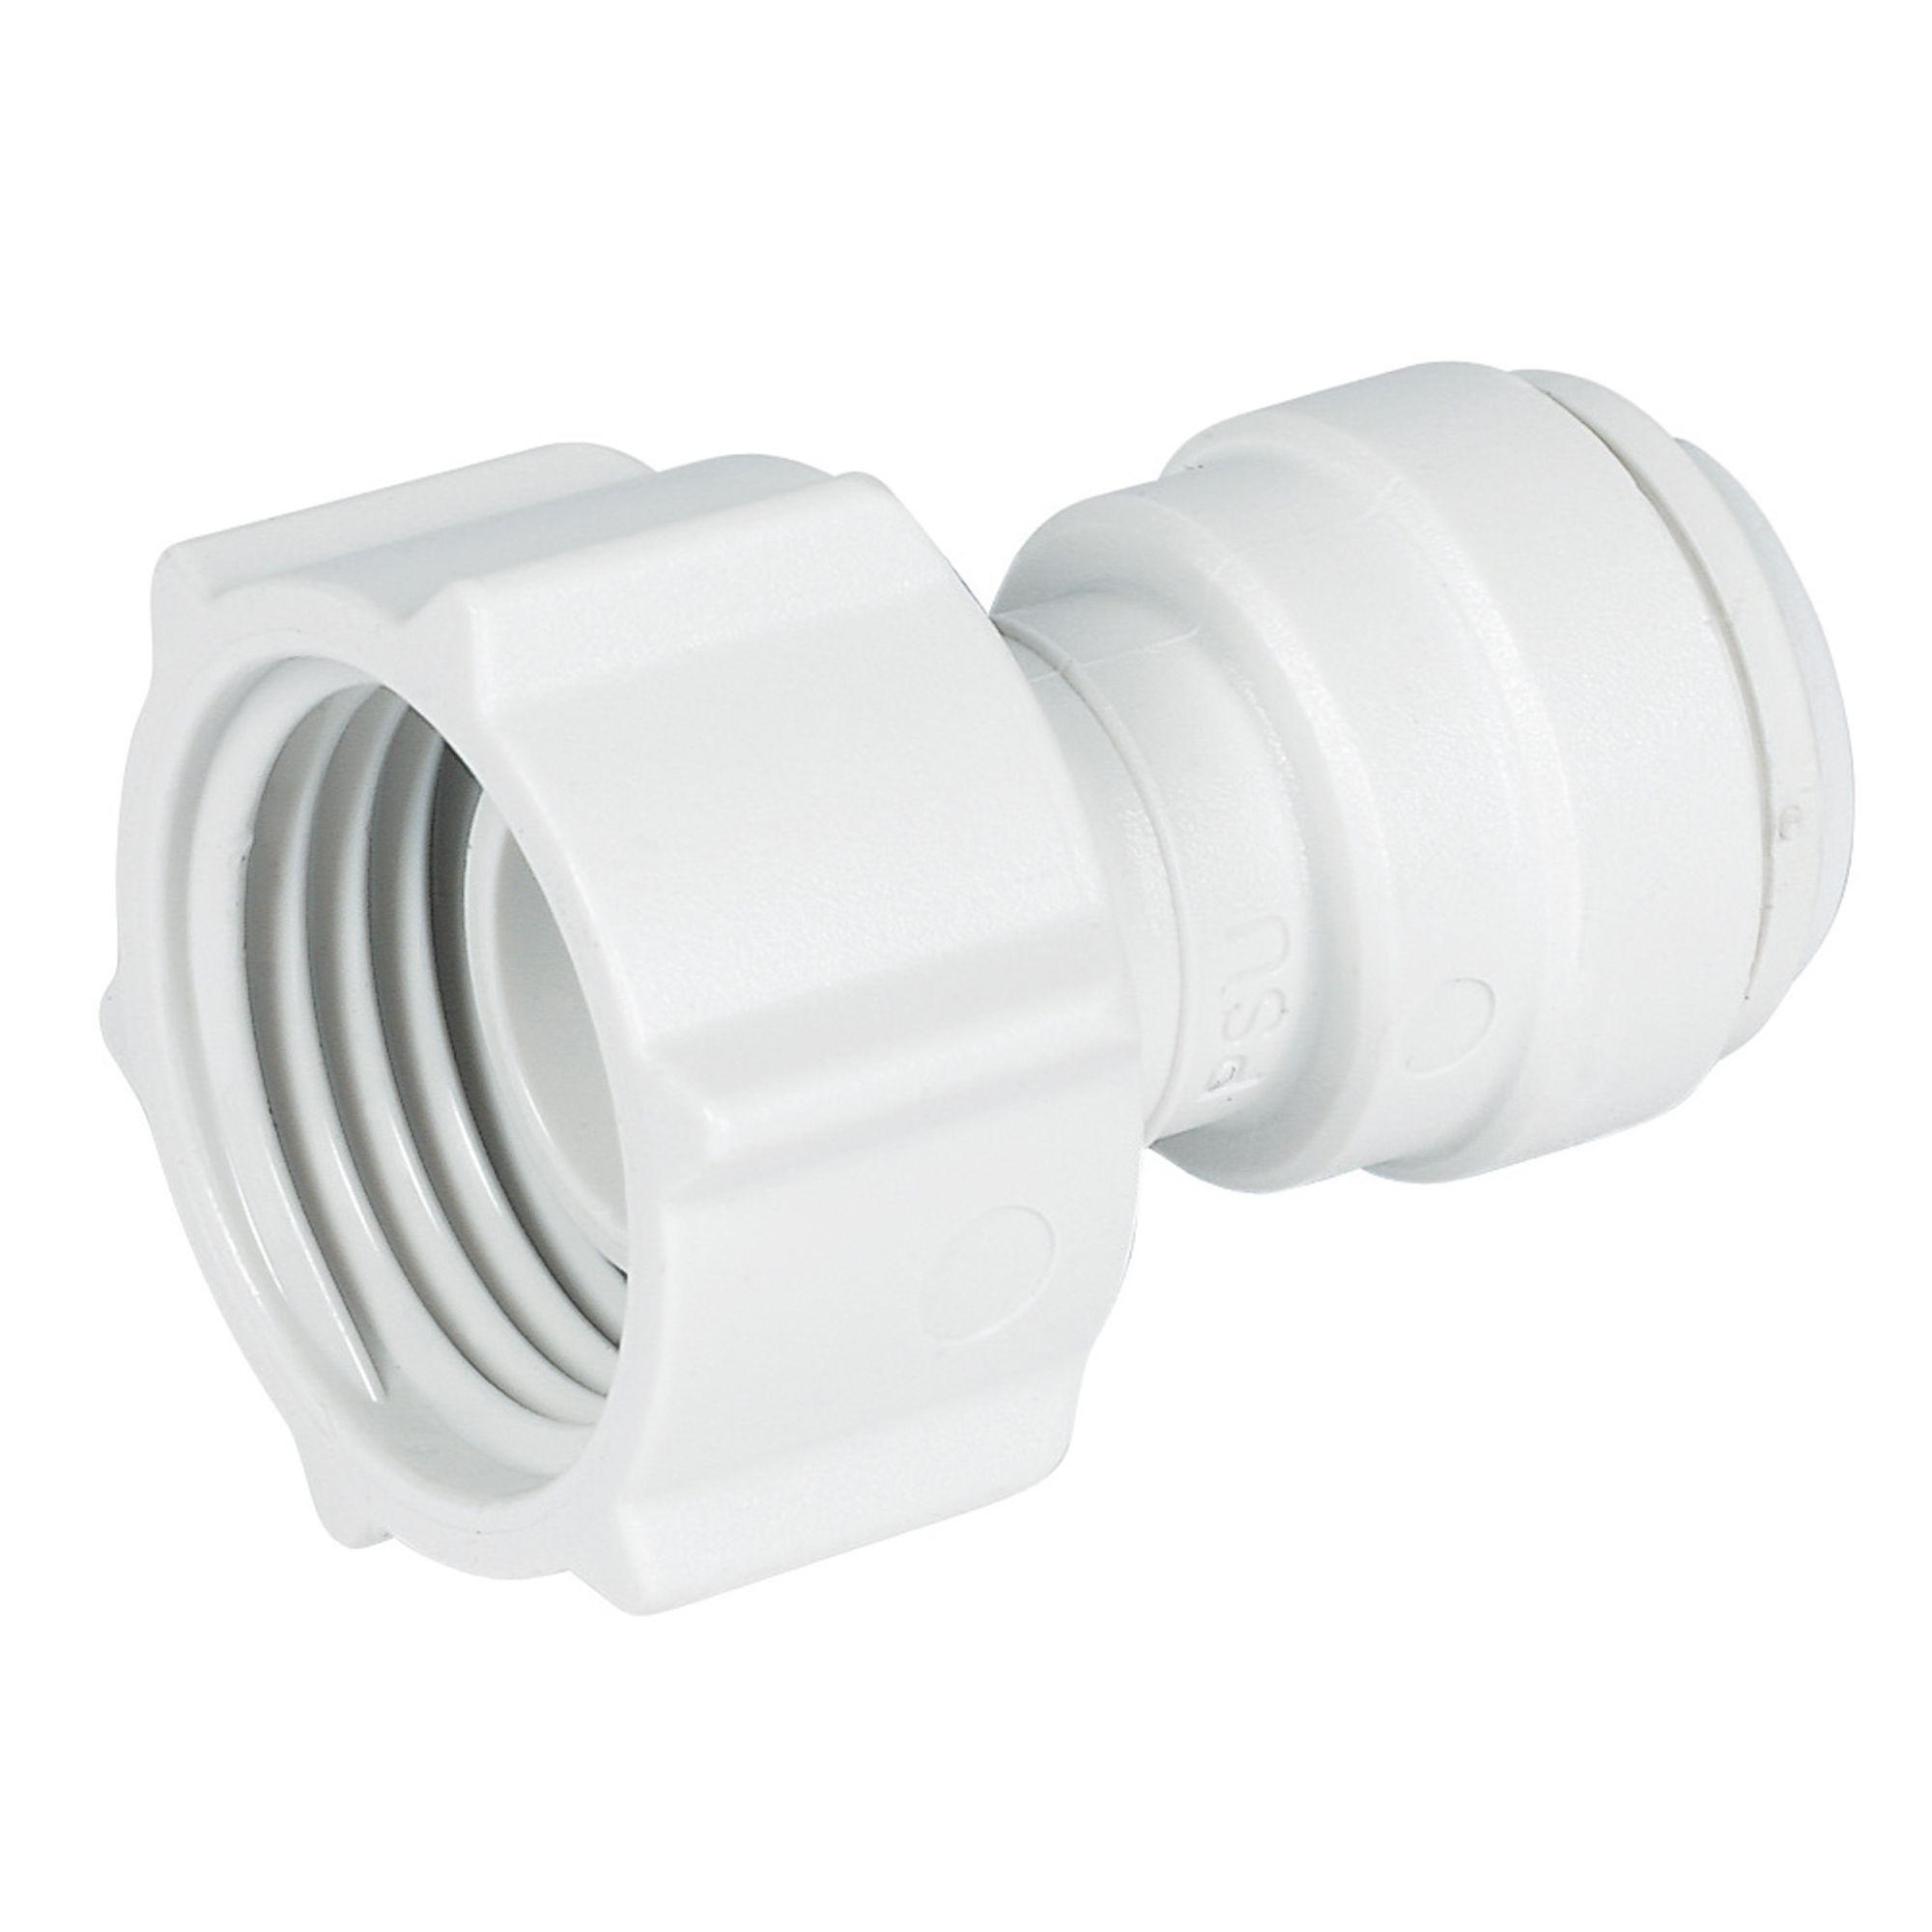 Jg Speedfit Push Fit Female Tap Connector Dia 10mm Pack